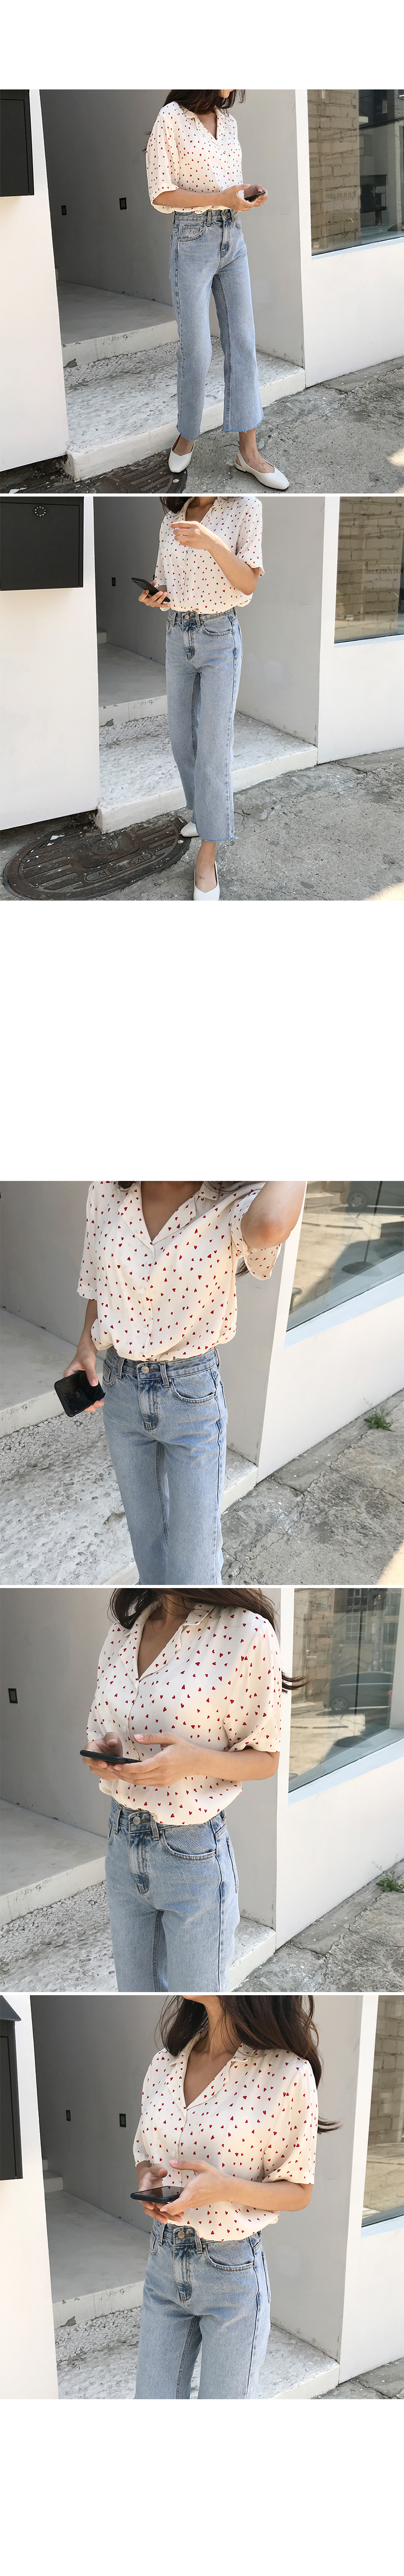 Heaven collar blouse